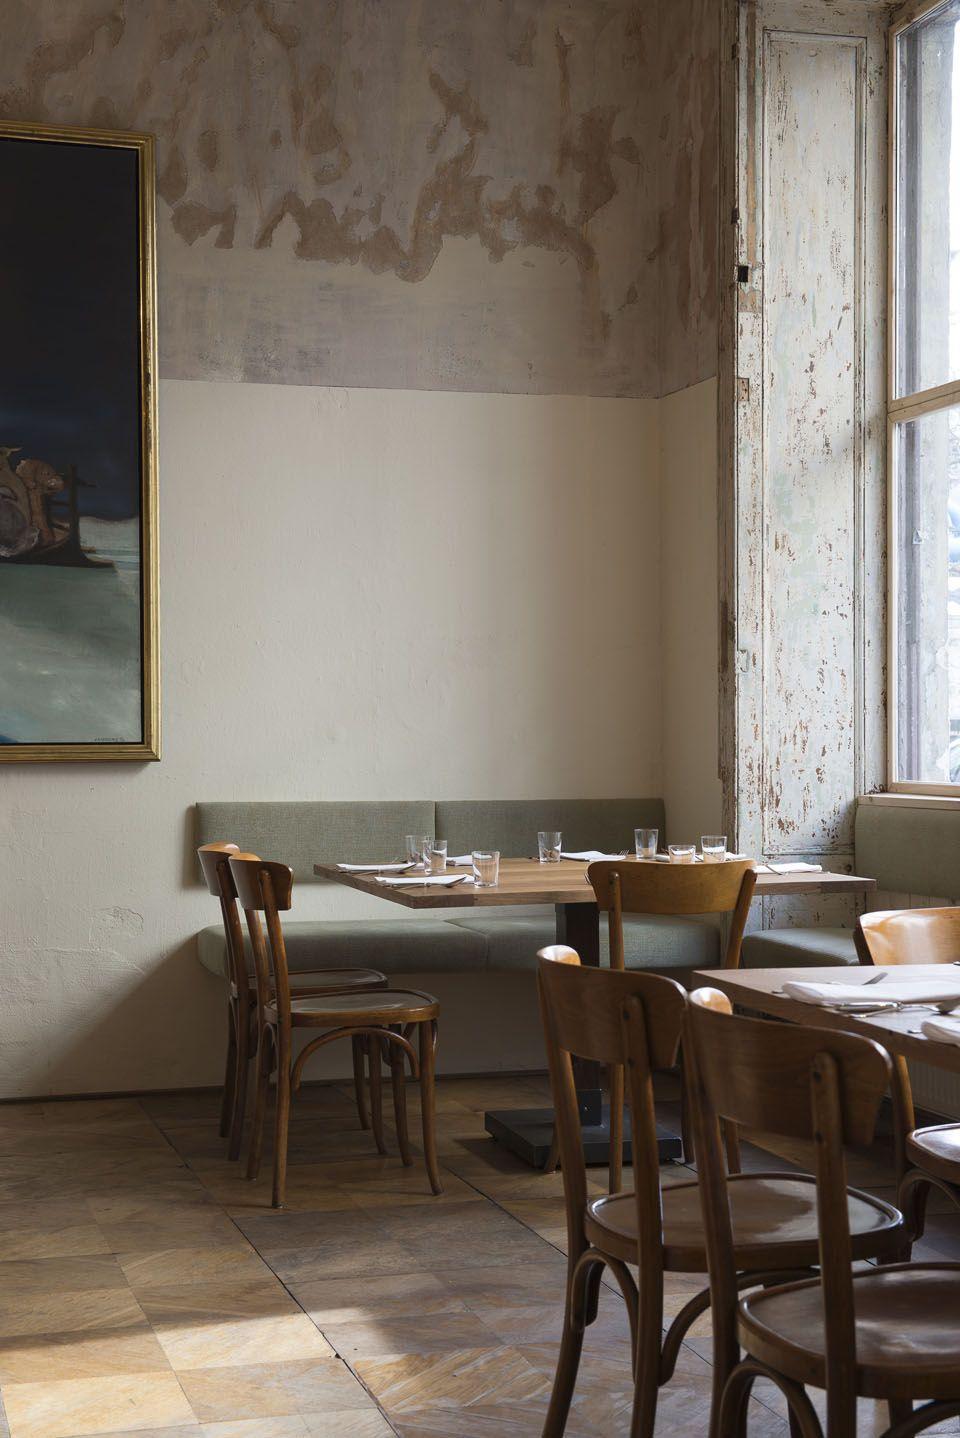 Summer House Interior Design Ideas From Berlin: Scandi In The Mitte: Antiqued Interiors At Dottír In Berlin